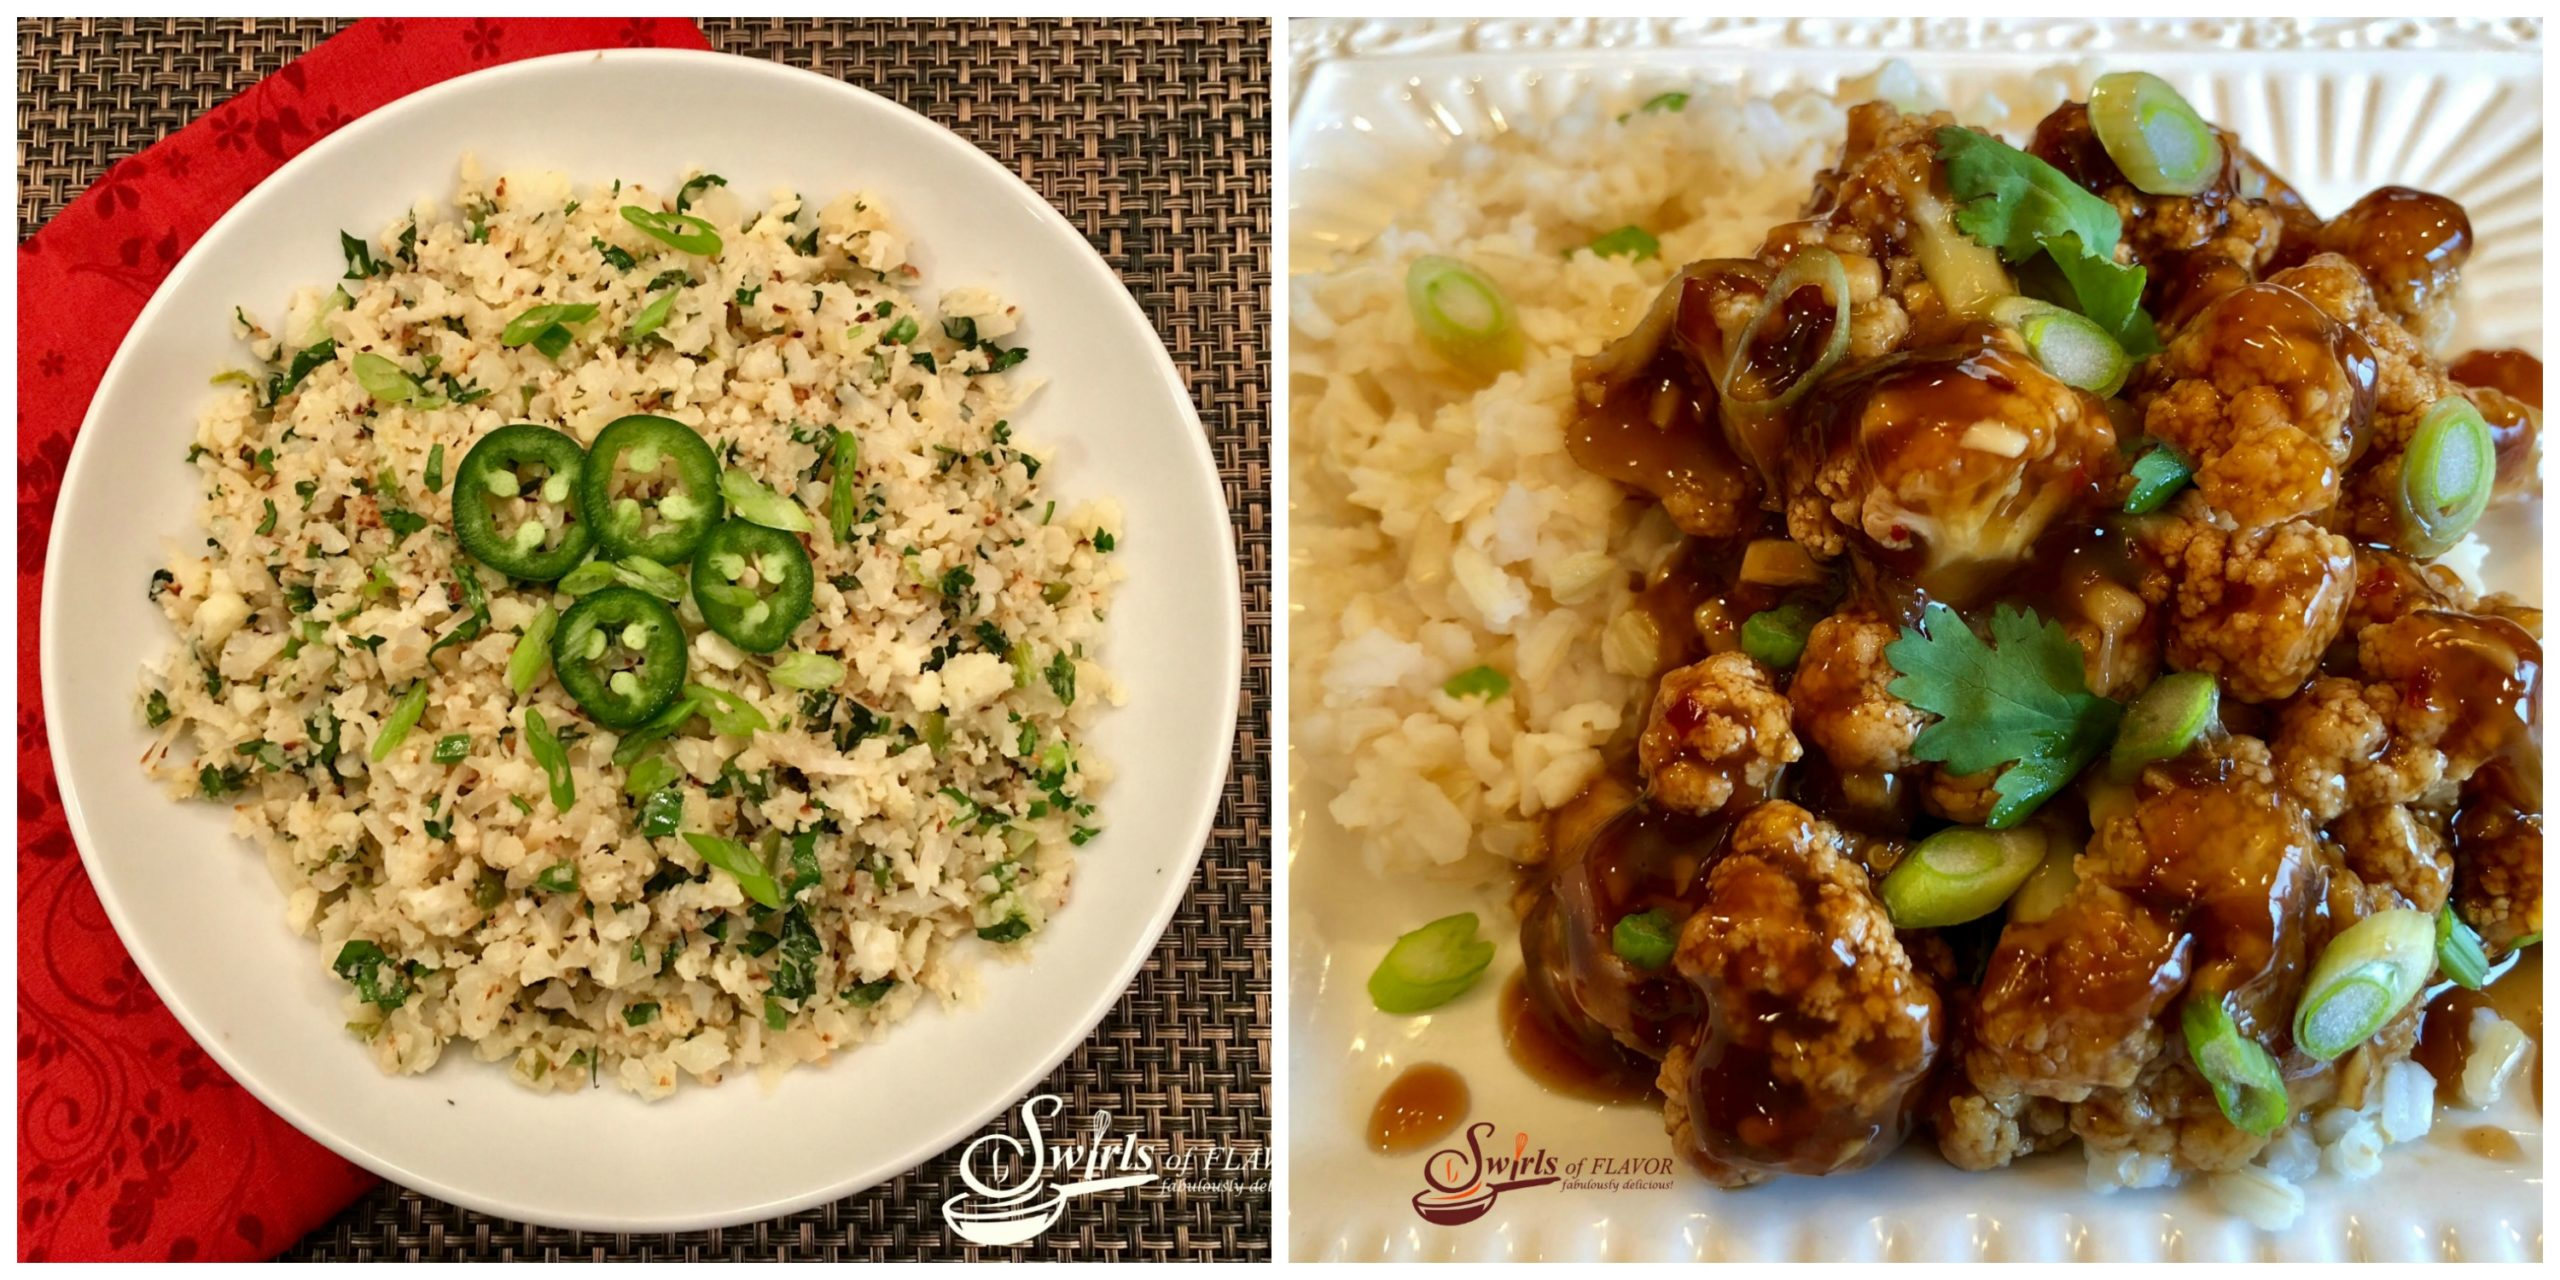 Jalapeno Lime Cauliflower Rice and General Tso's Cauliflower